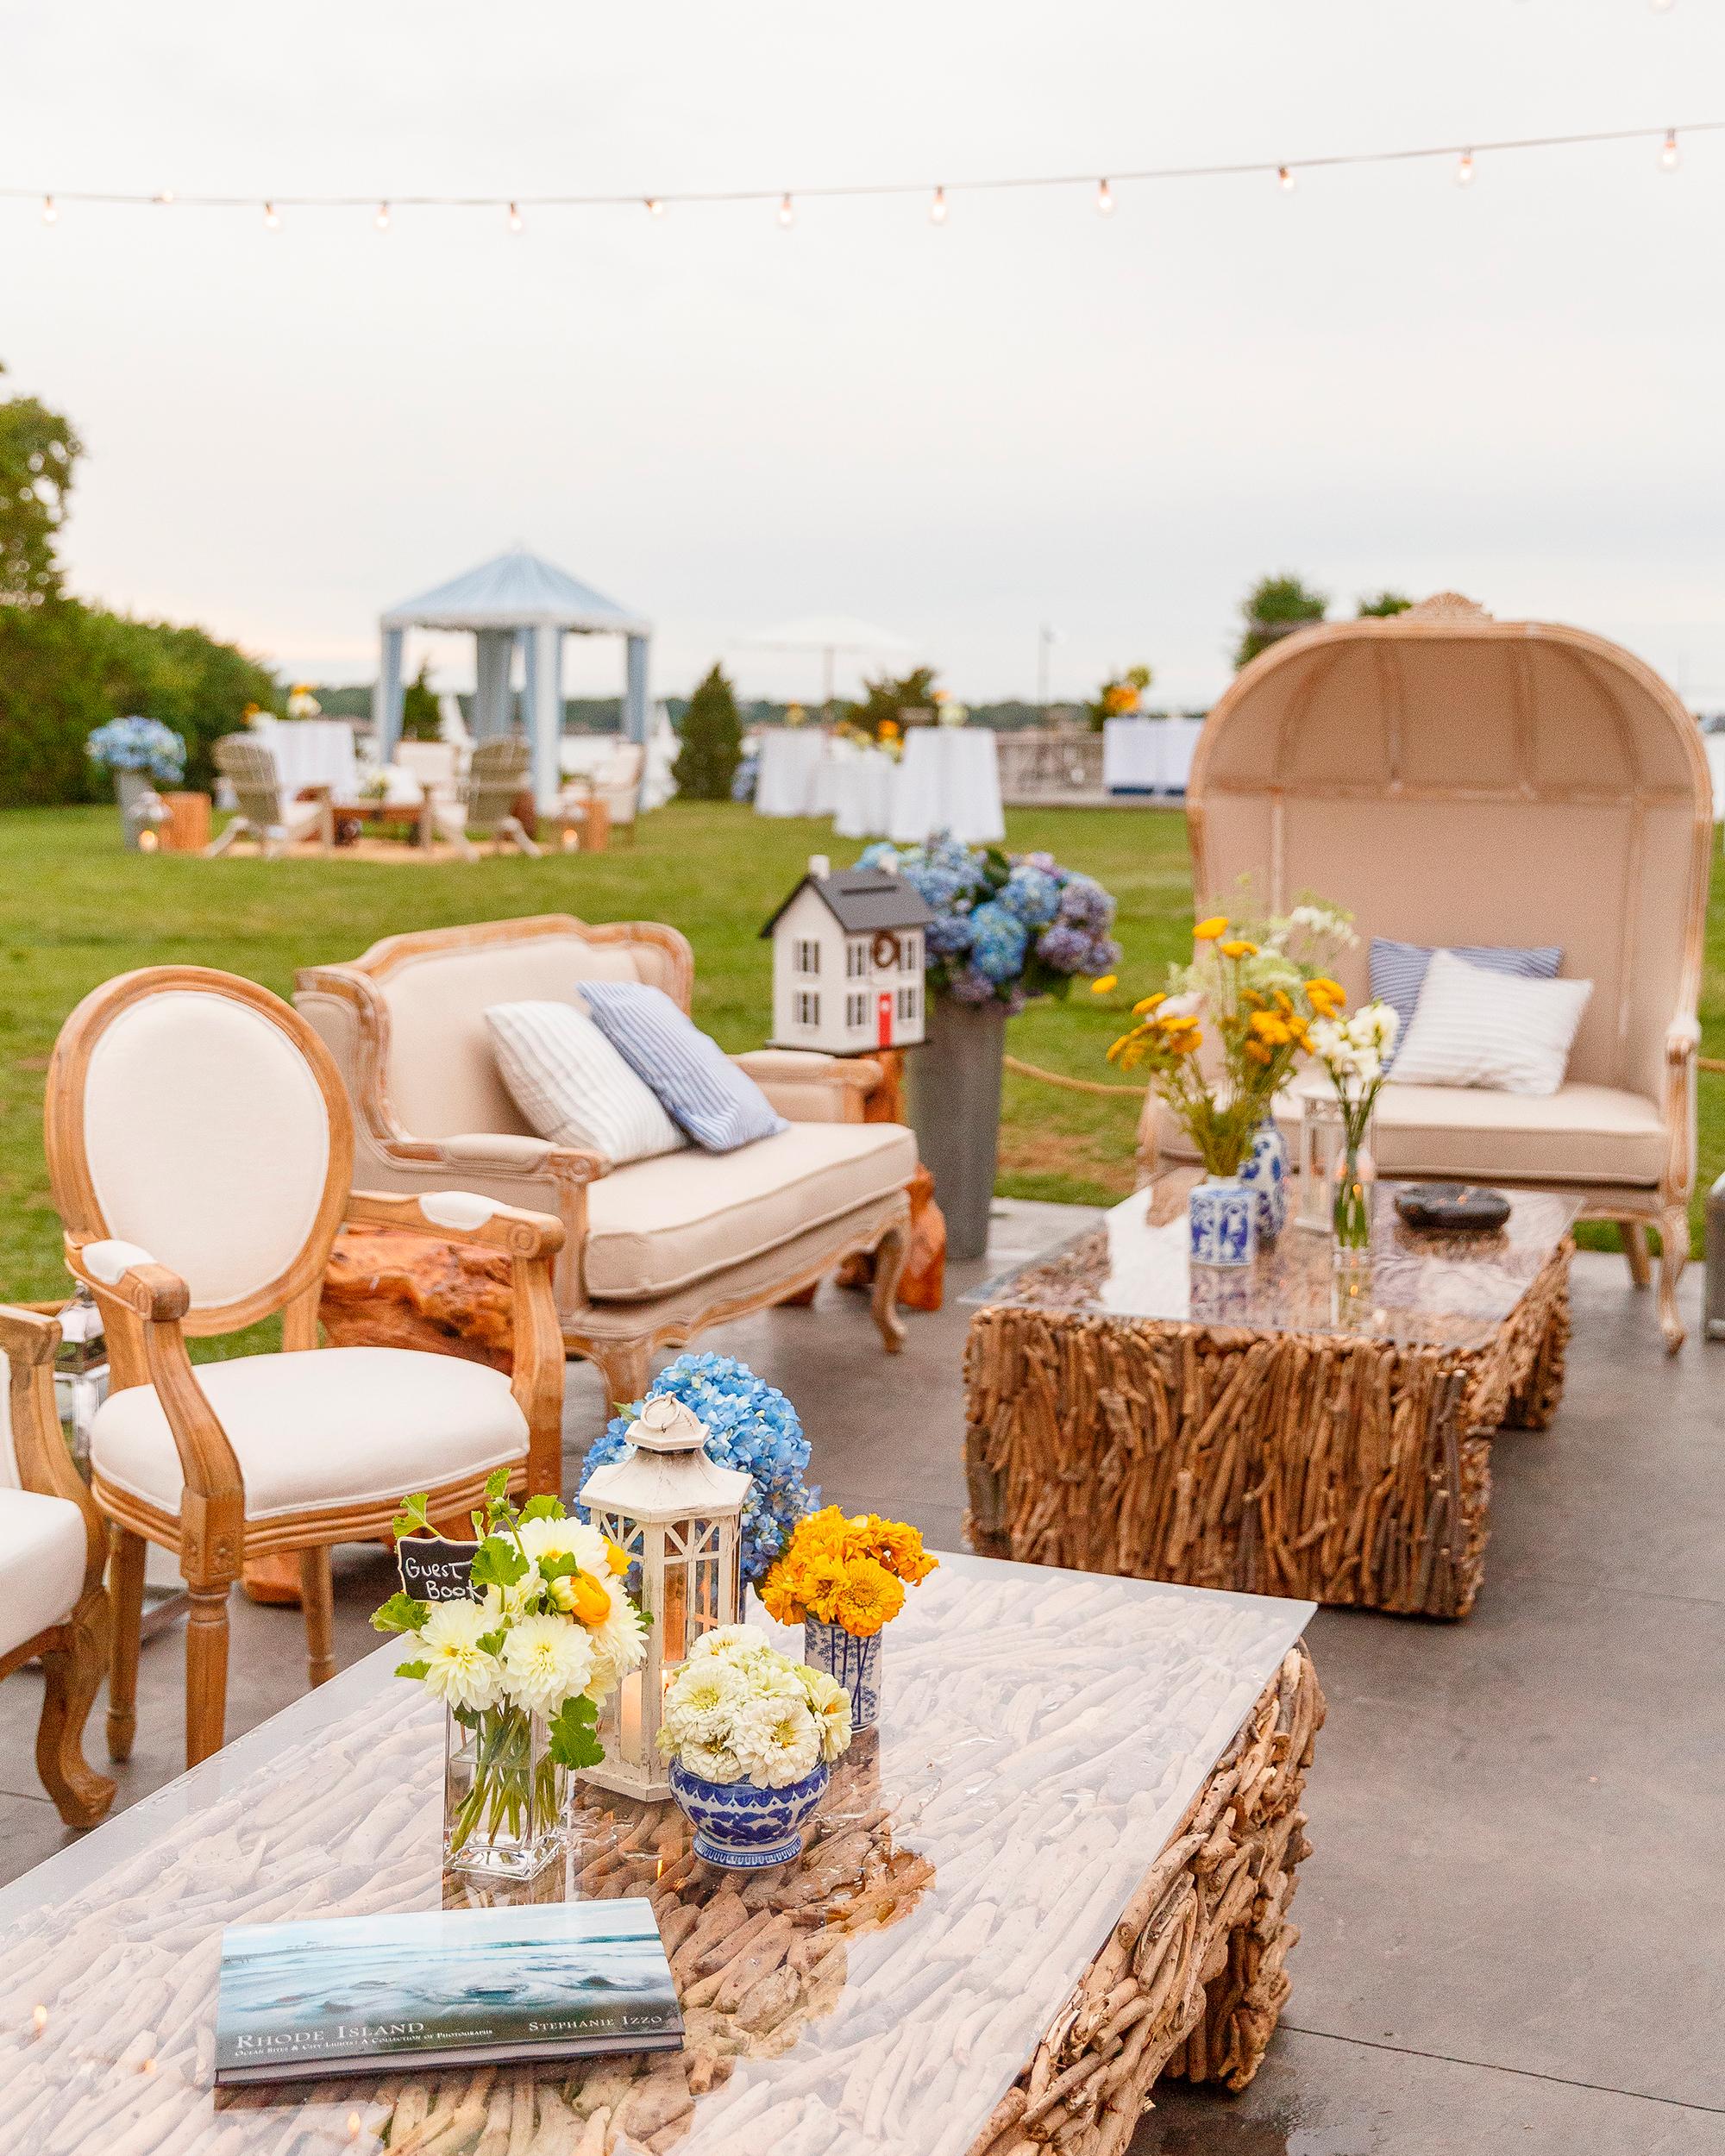 kristel-austin-wedding-lounge-0836-s11860-0415.jpg